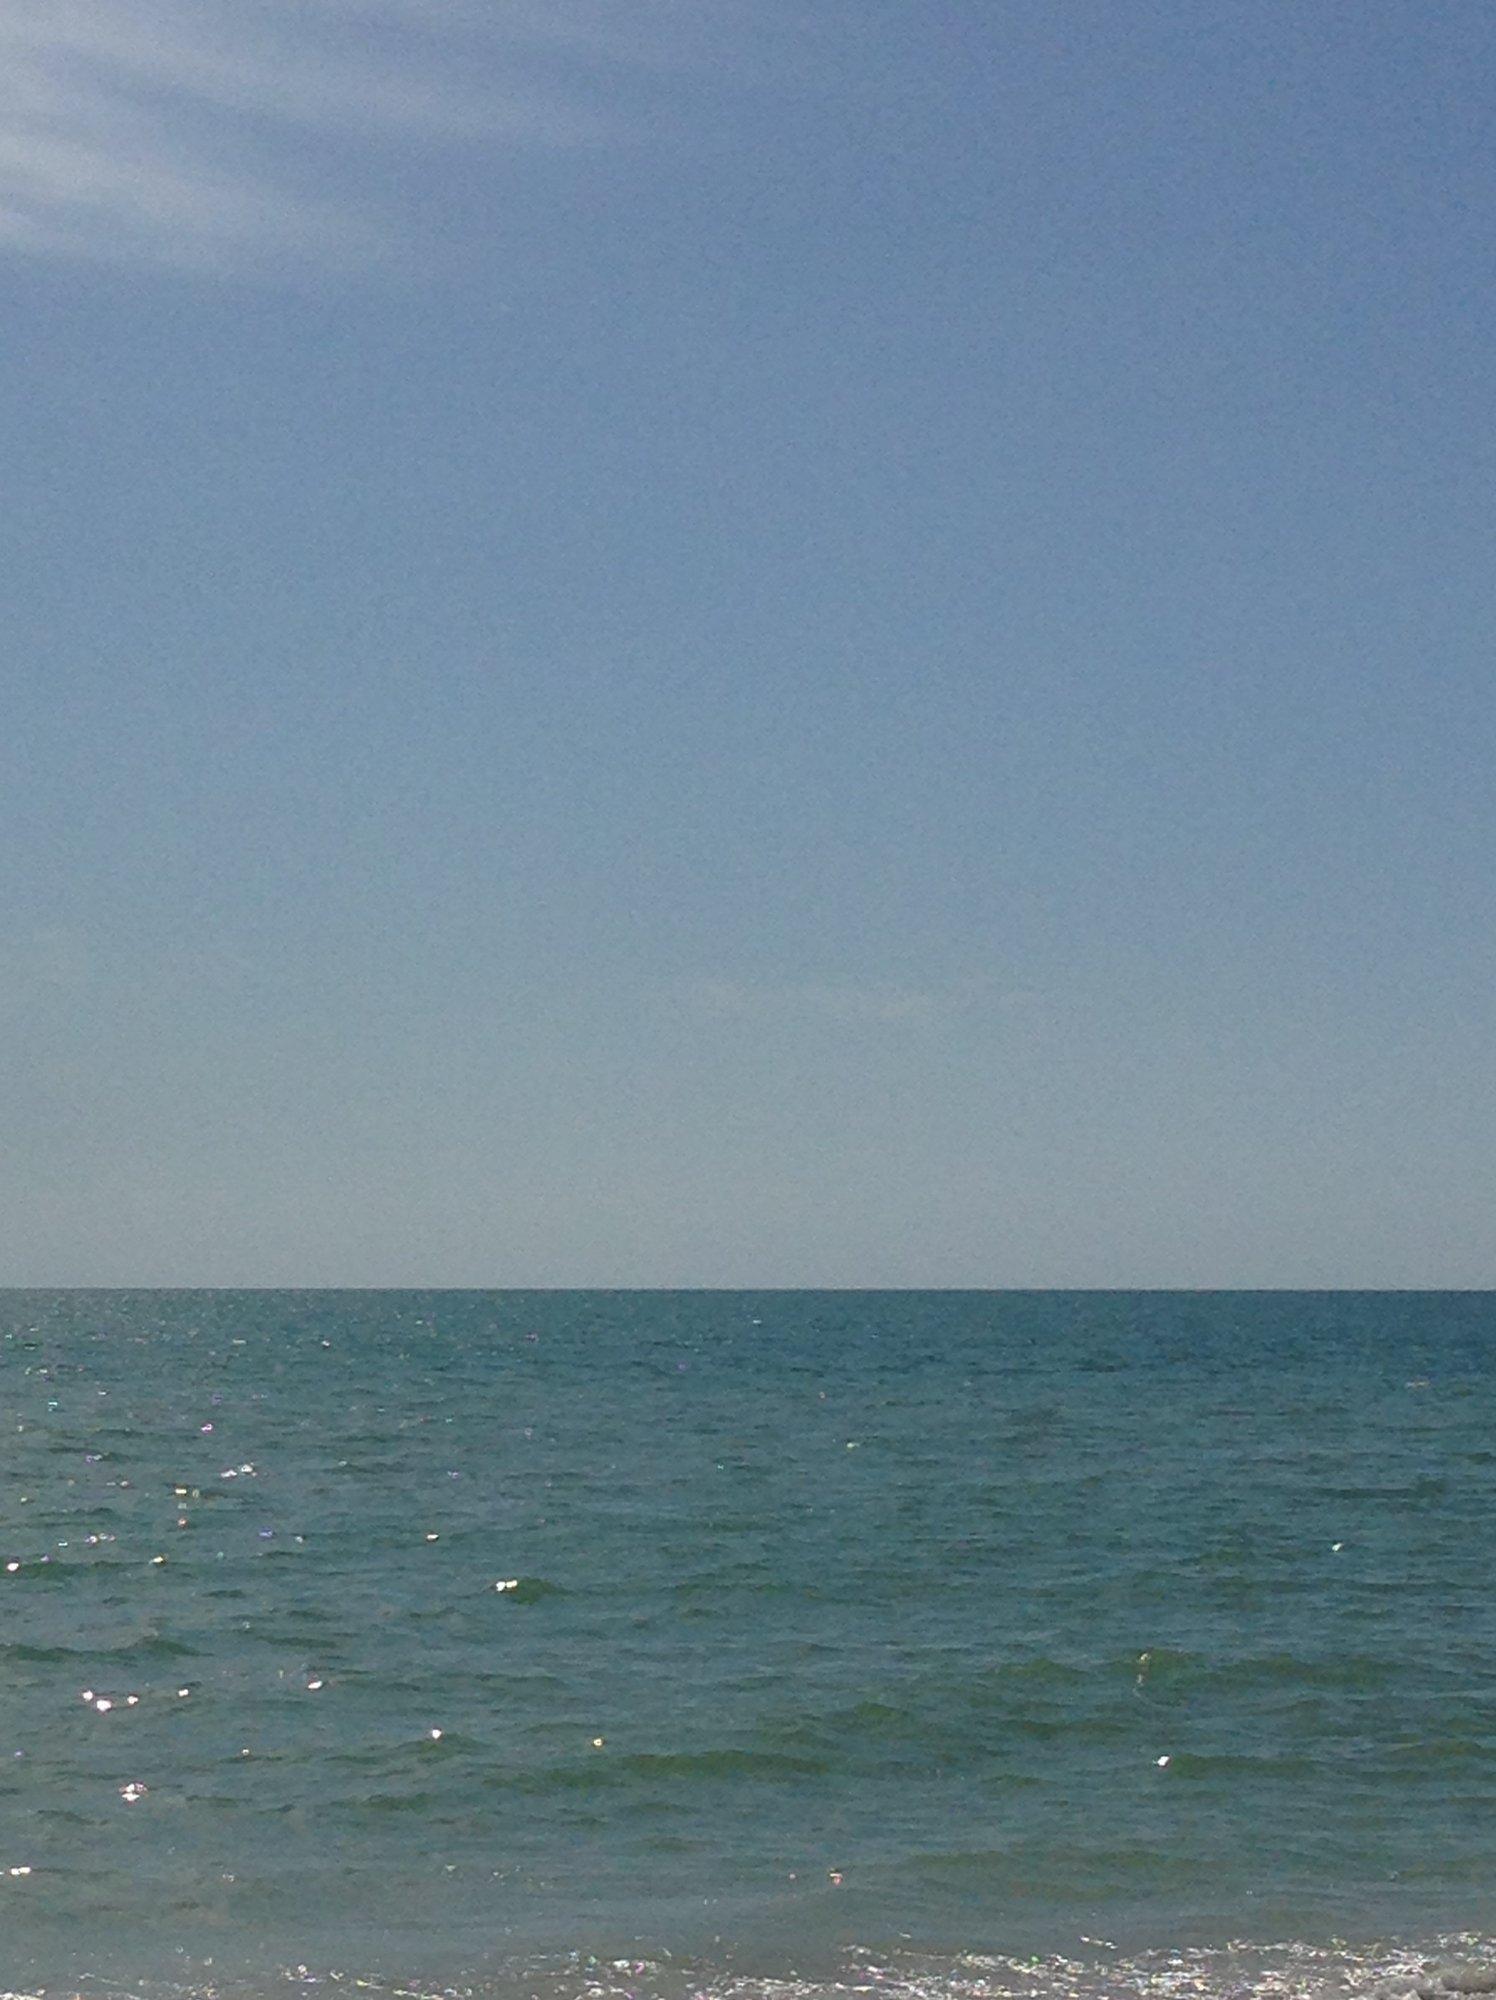 Naples beaches